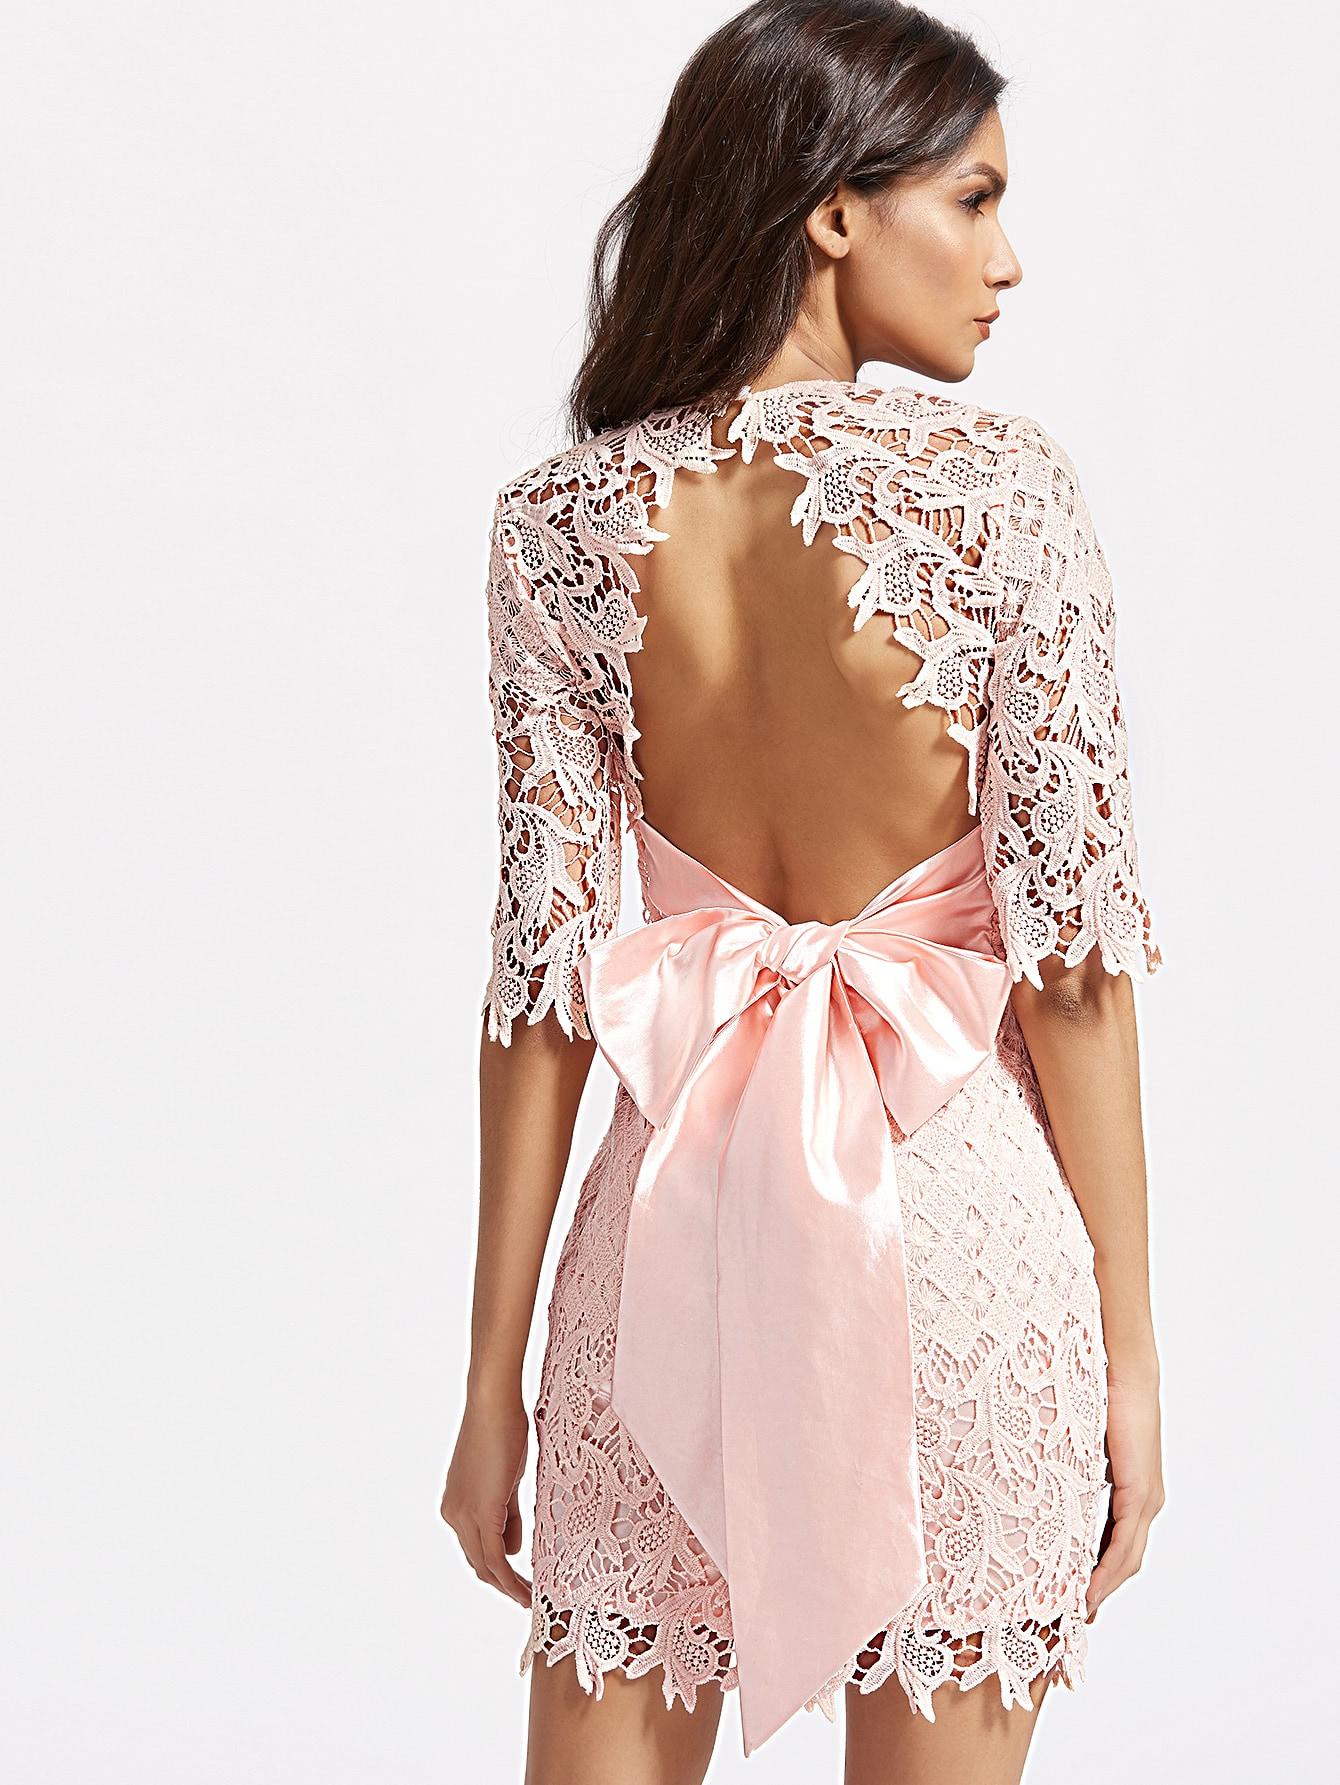 Фото Bow Tie Open Back Embroidered Lace Overlay Dress. Купить с доставкой